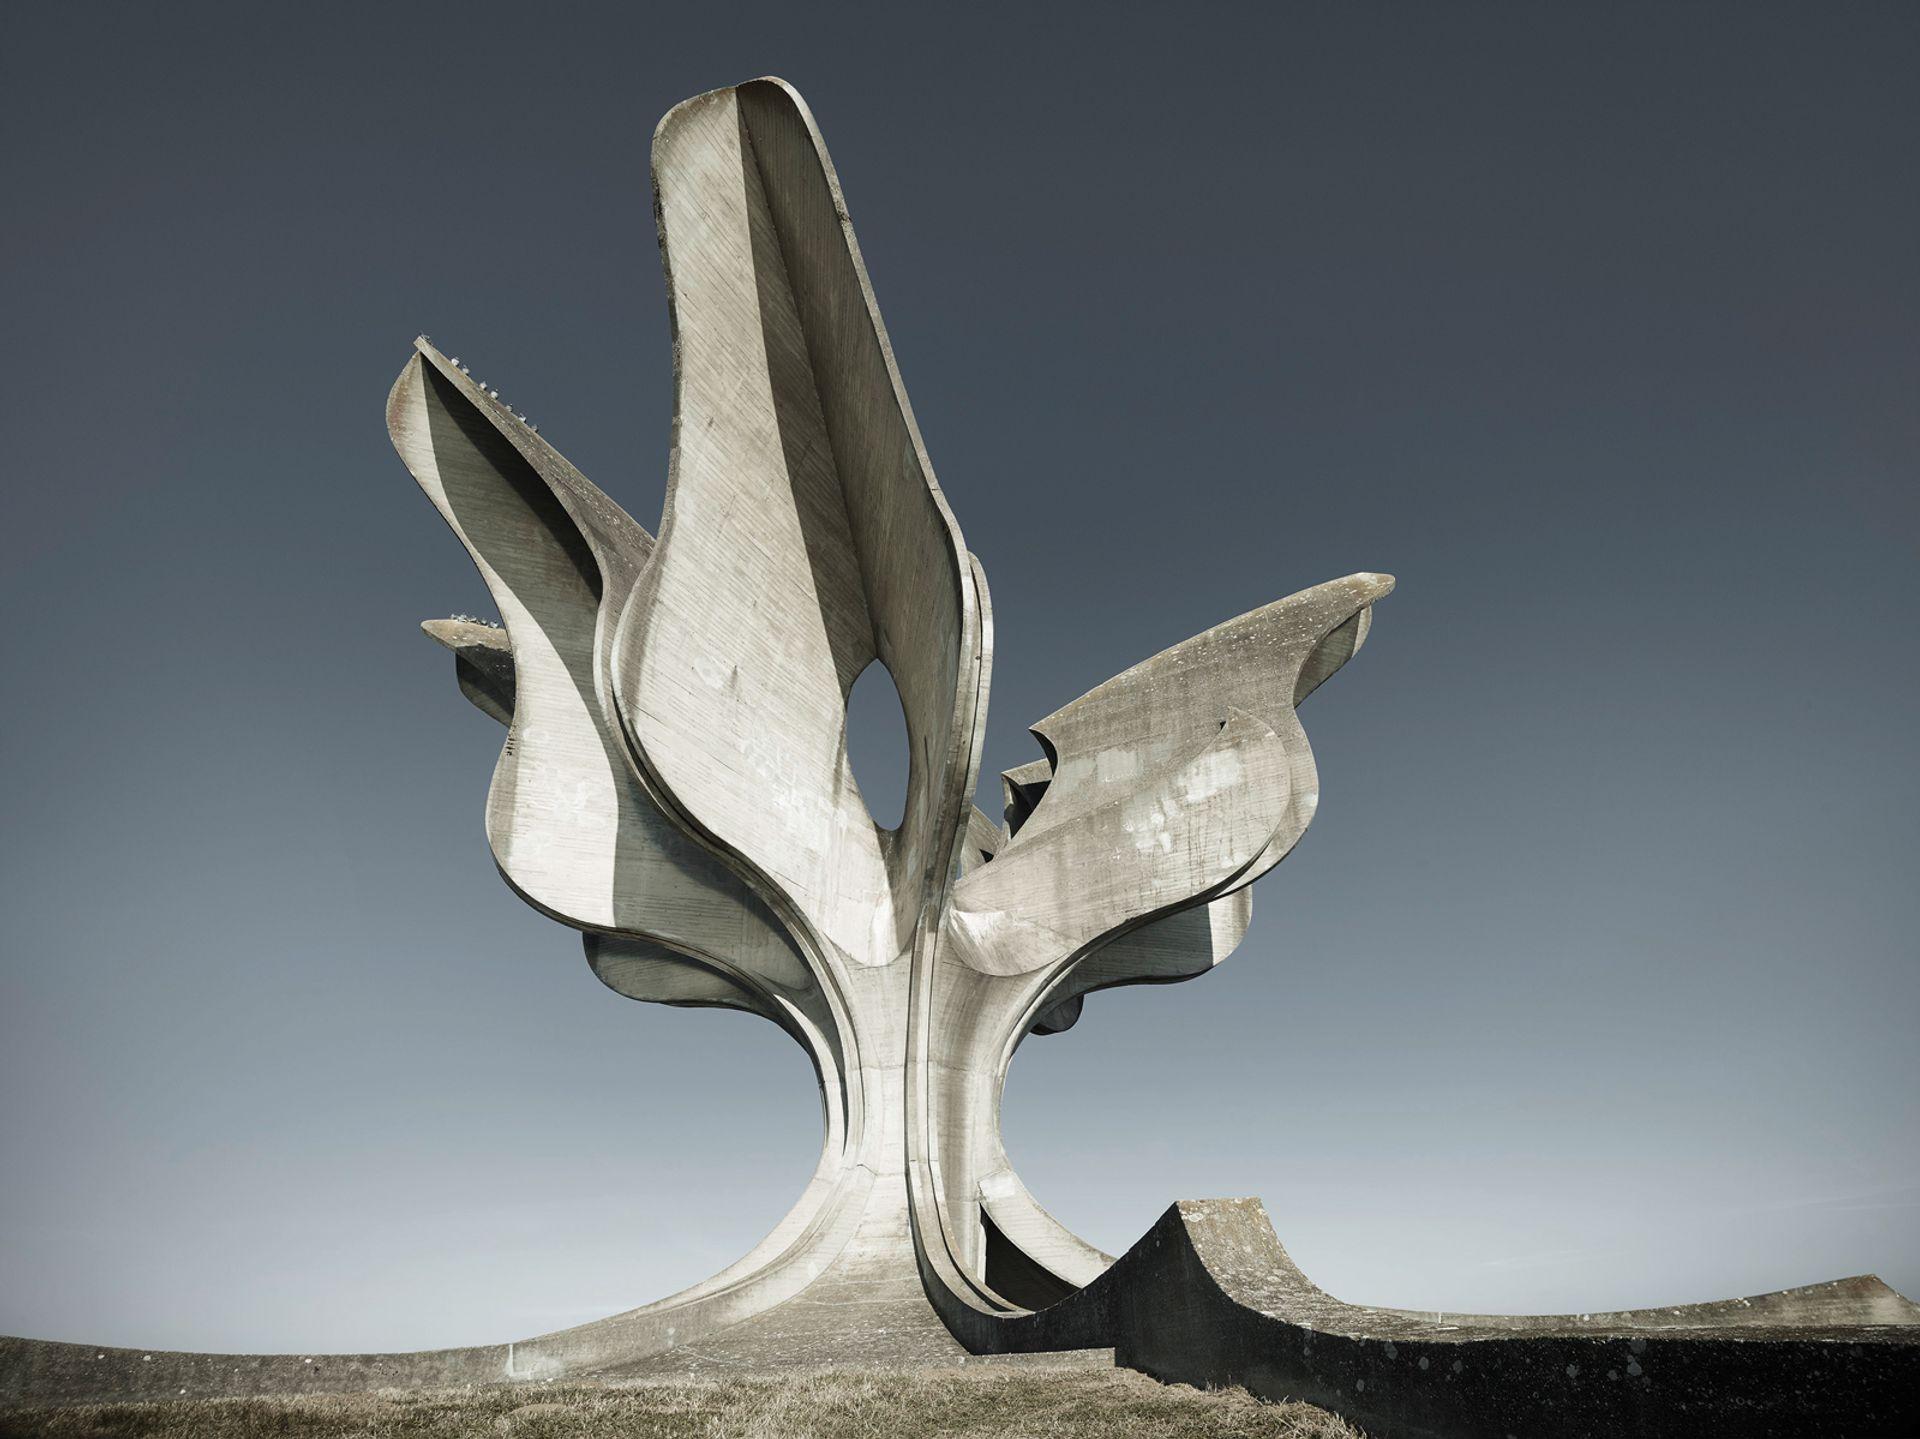 The Jasenovac Memorial by Bogdan Bogdanović's (1959-66) Courtesy of the artist; Photo: Valentin Jeck